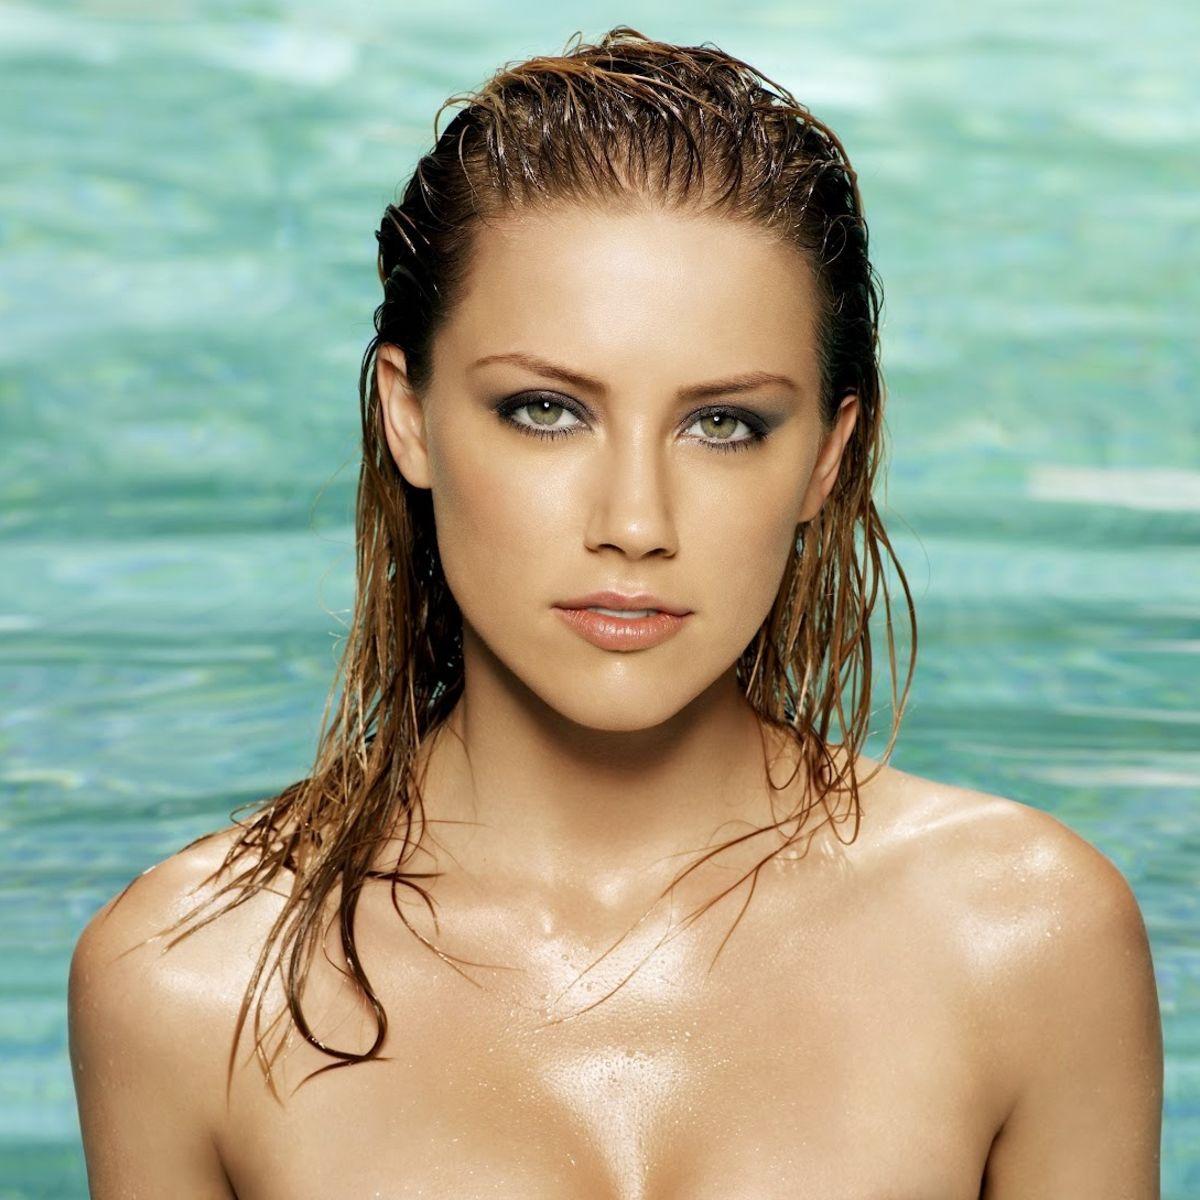 Amber-Heard-swimsuit.jpg